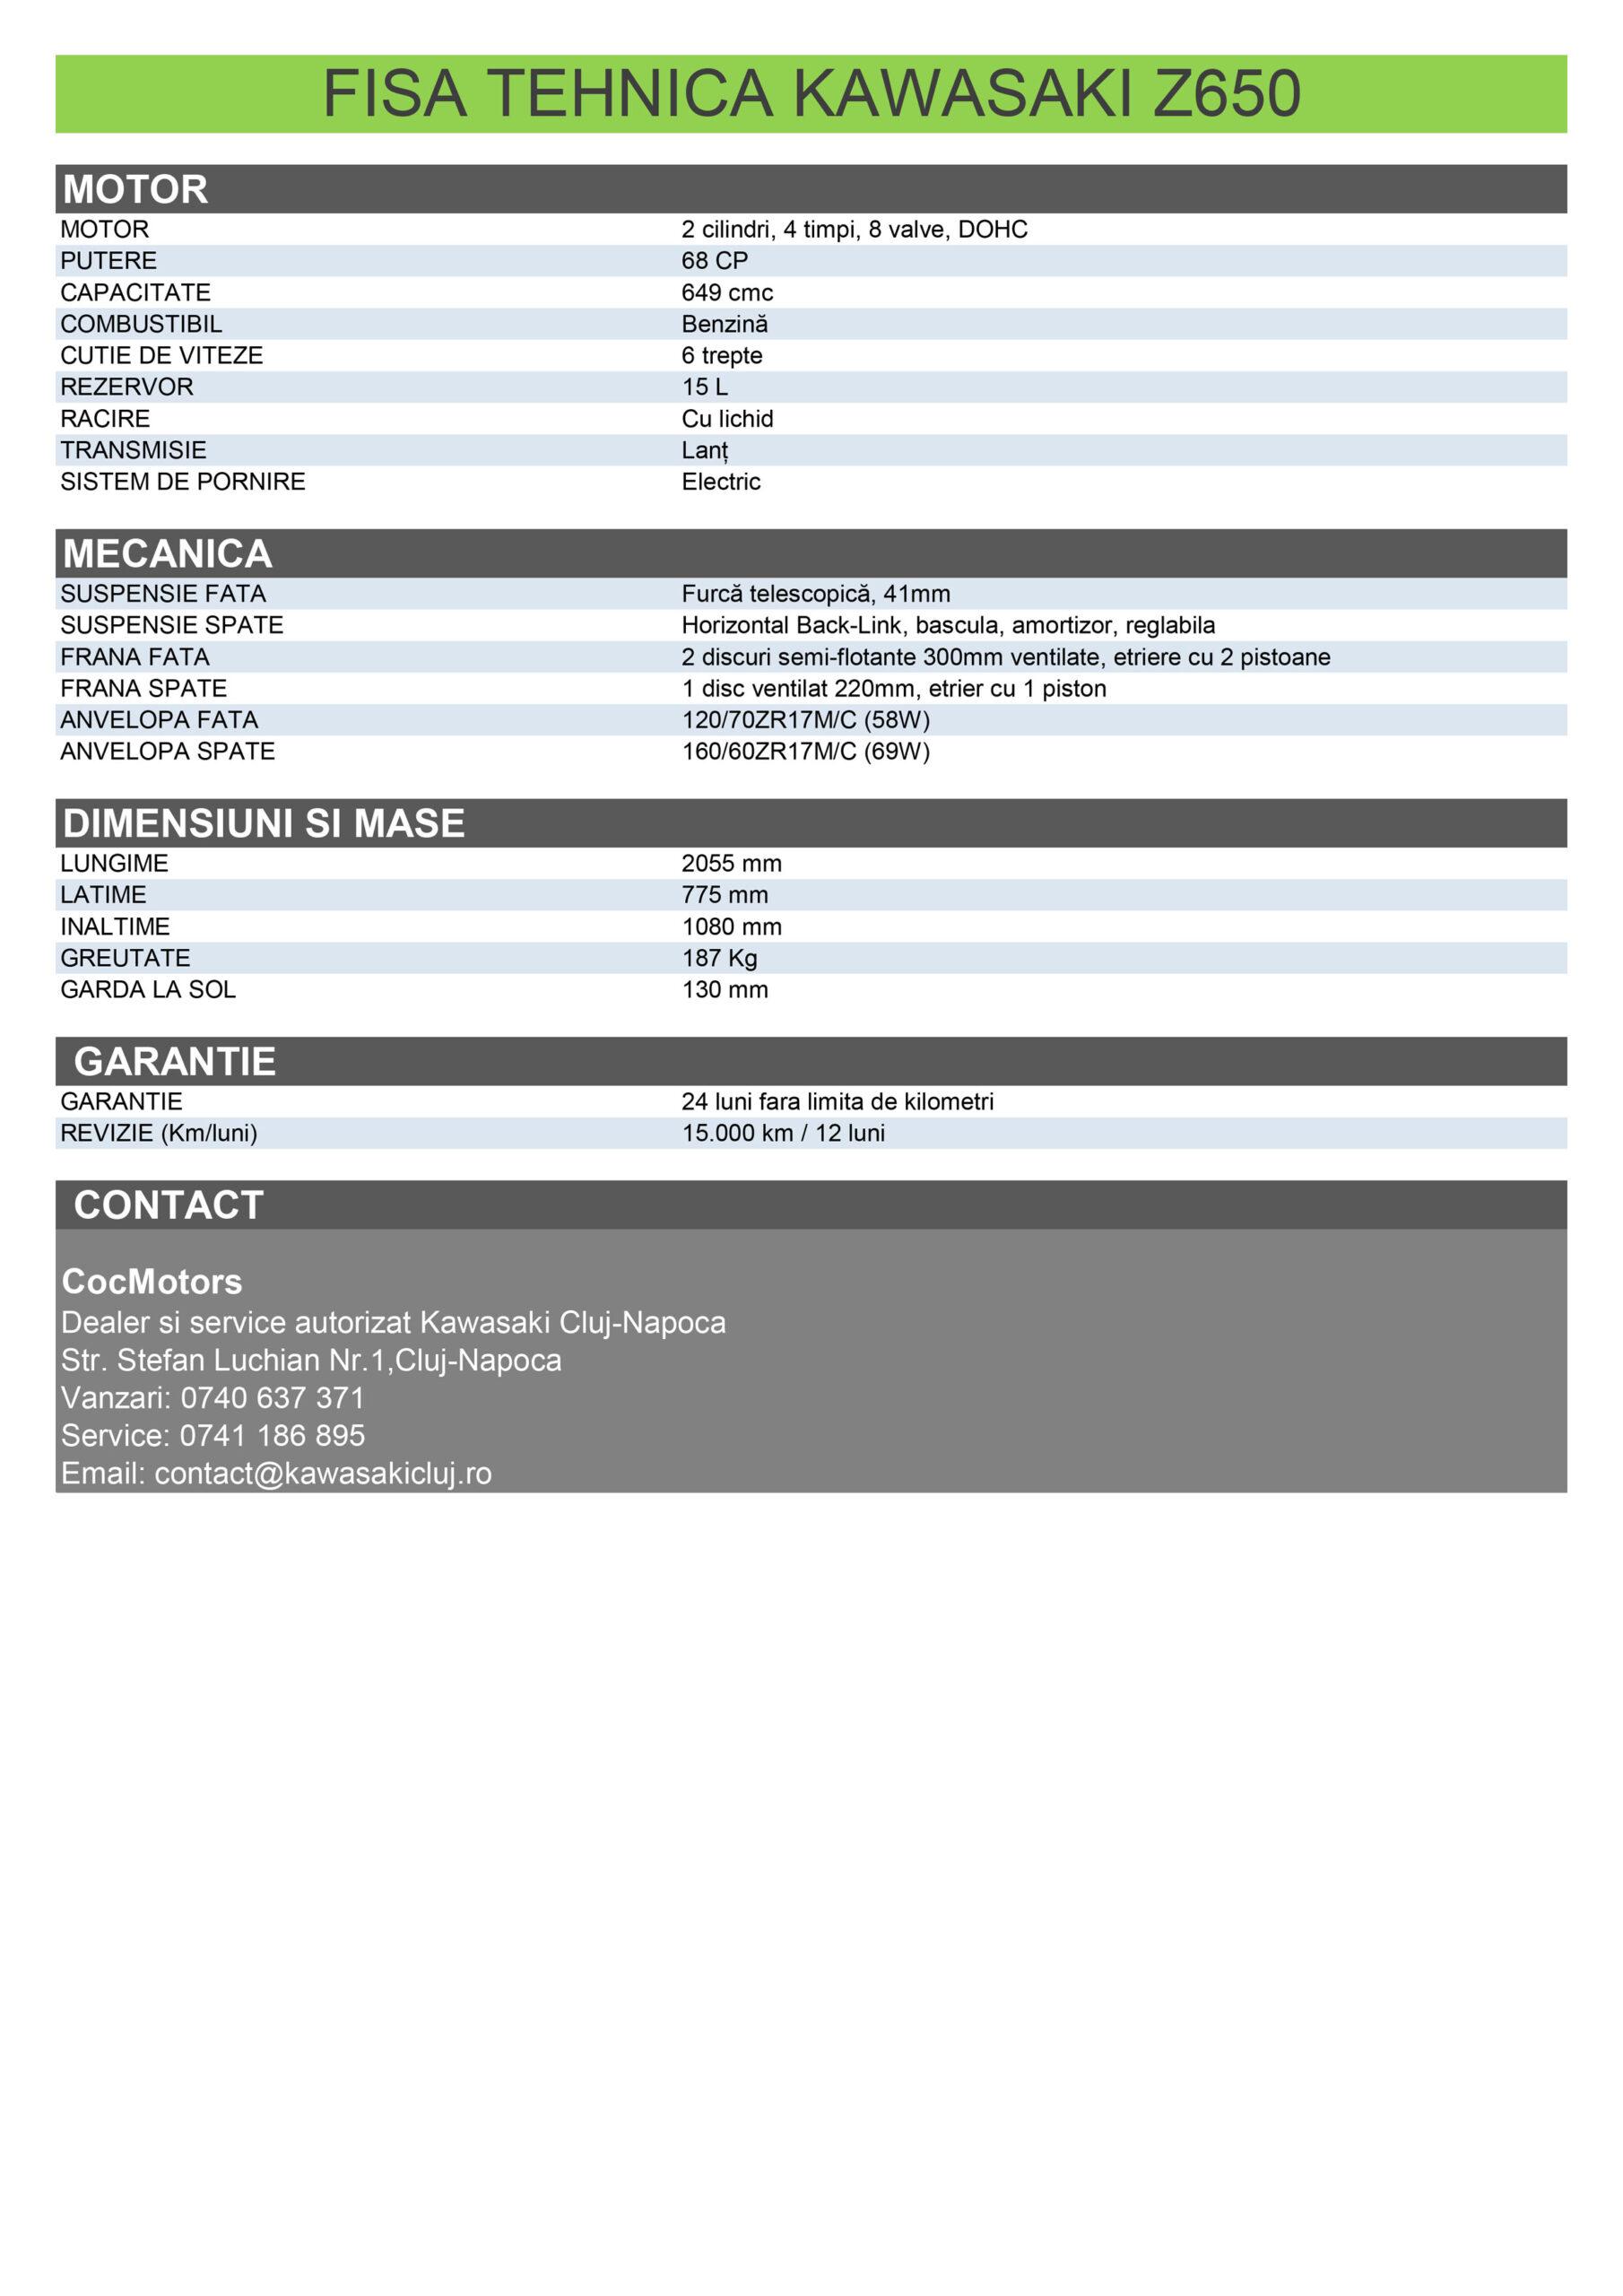 CocMotors - Kawasaki Z650 2021